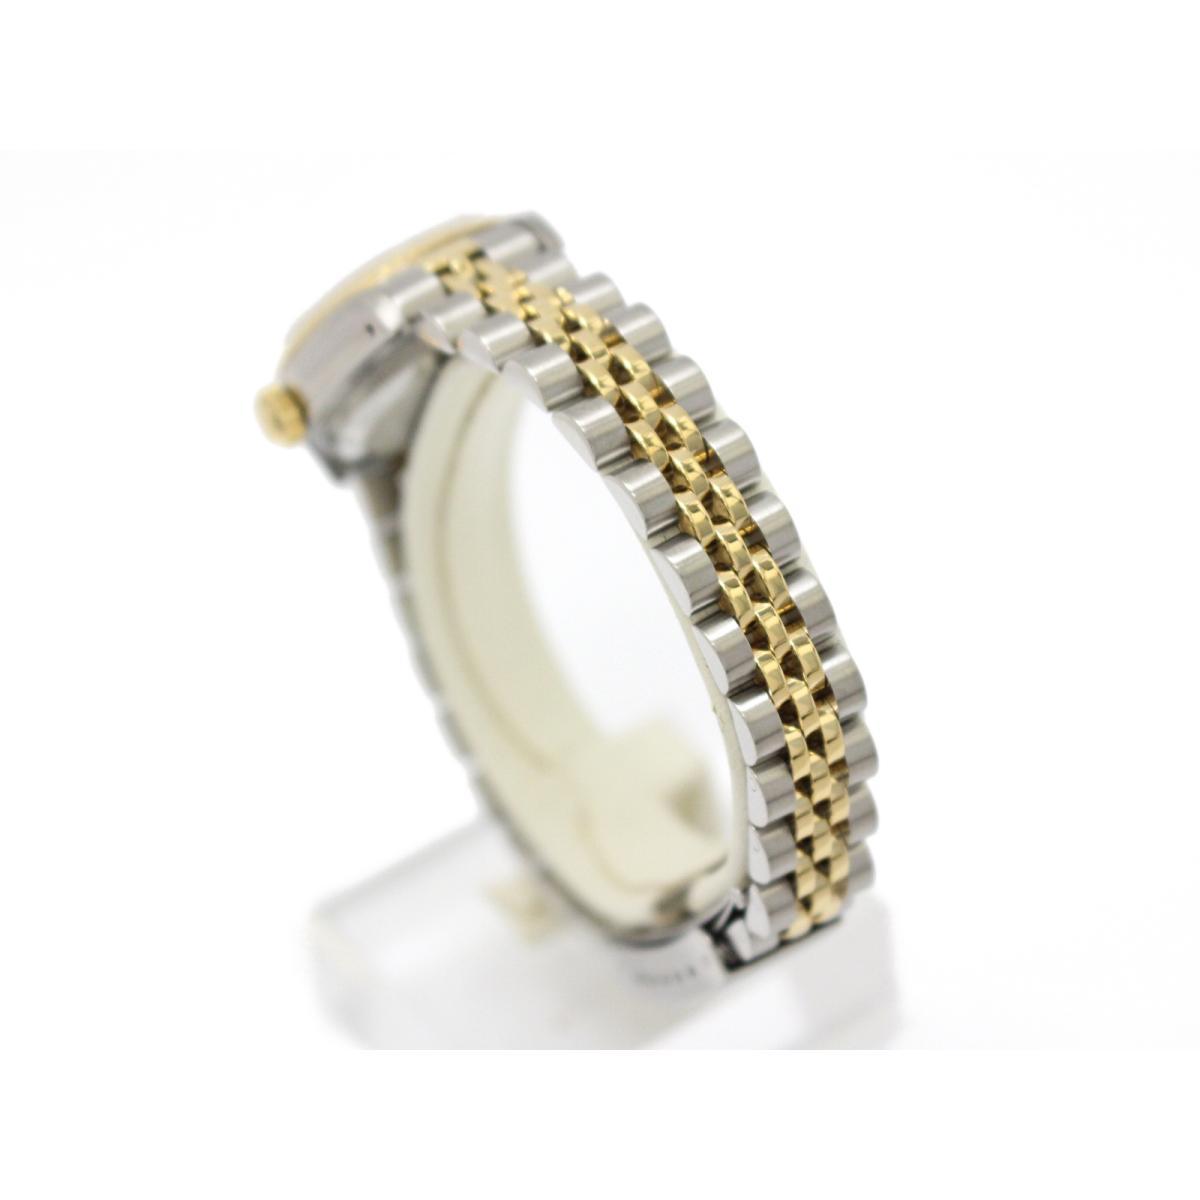 c214a7ffd ... Auth ROLEX Datejust Ladies Watch Quartz K18YG Yellow gold x stainless  steel Used | BRANDOFF Ginza ...